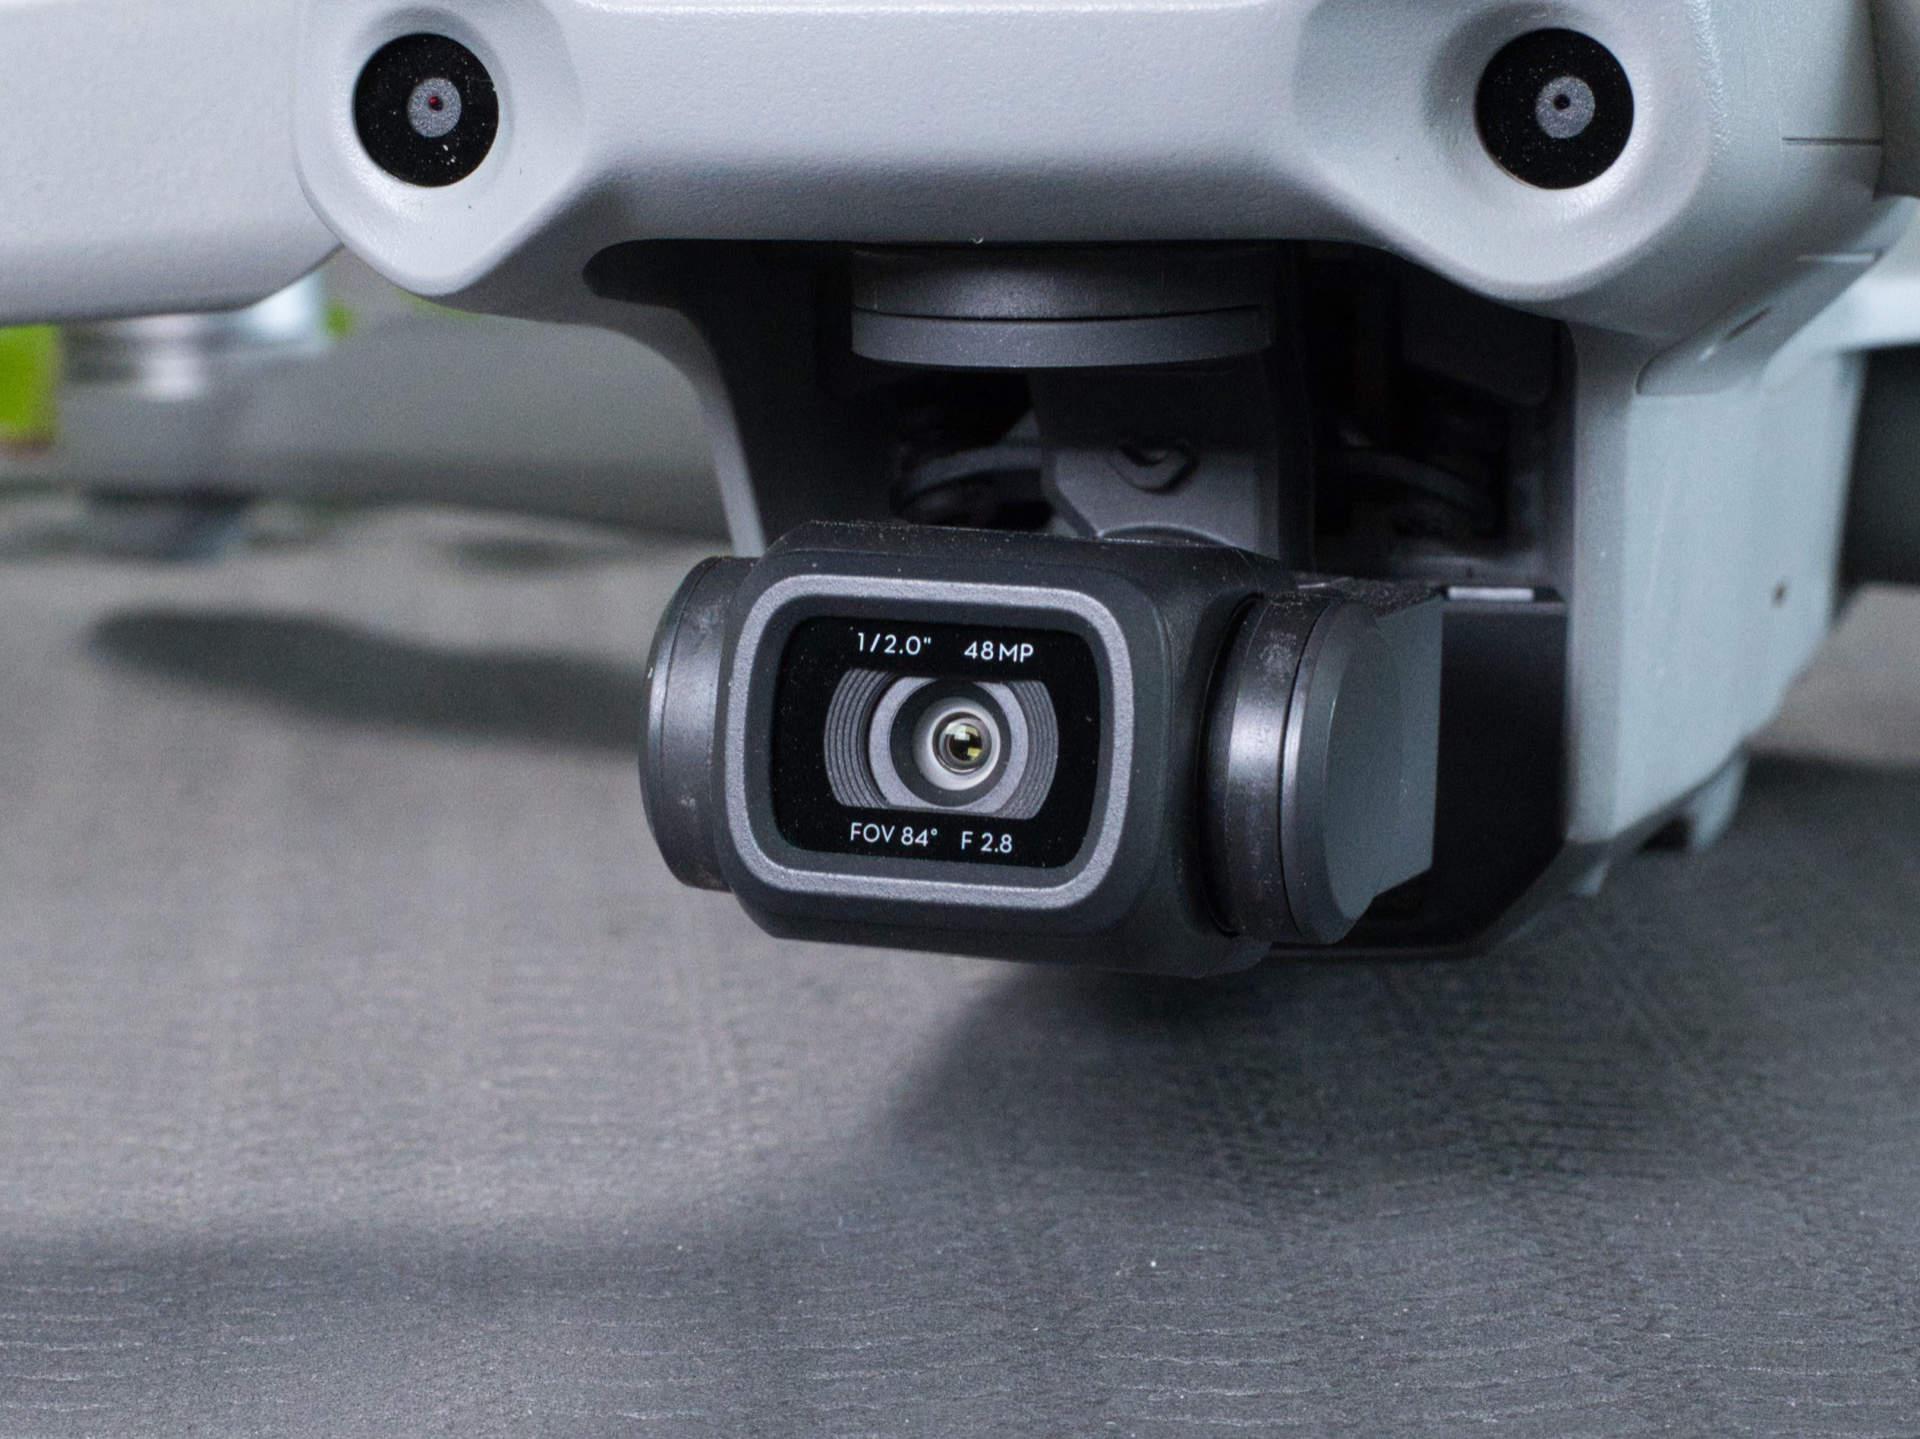 Großaufnahme der Mavic Air 2 Kamera